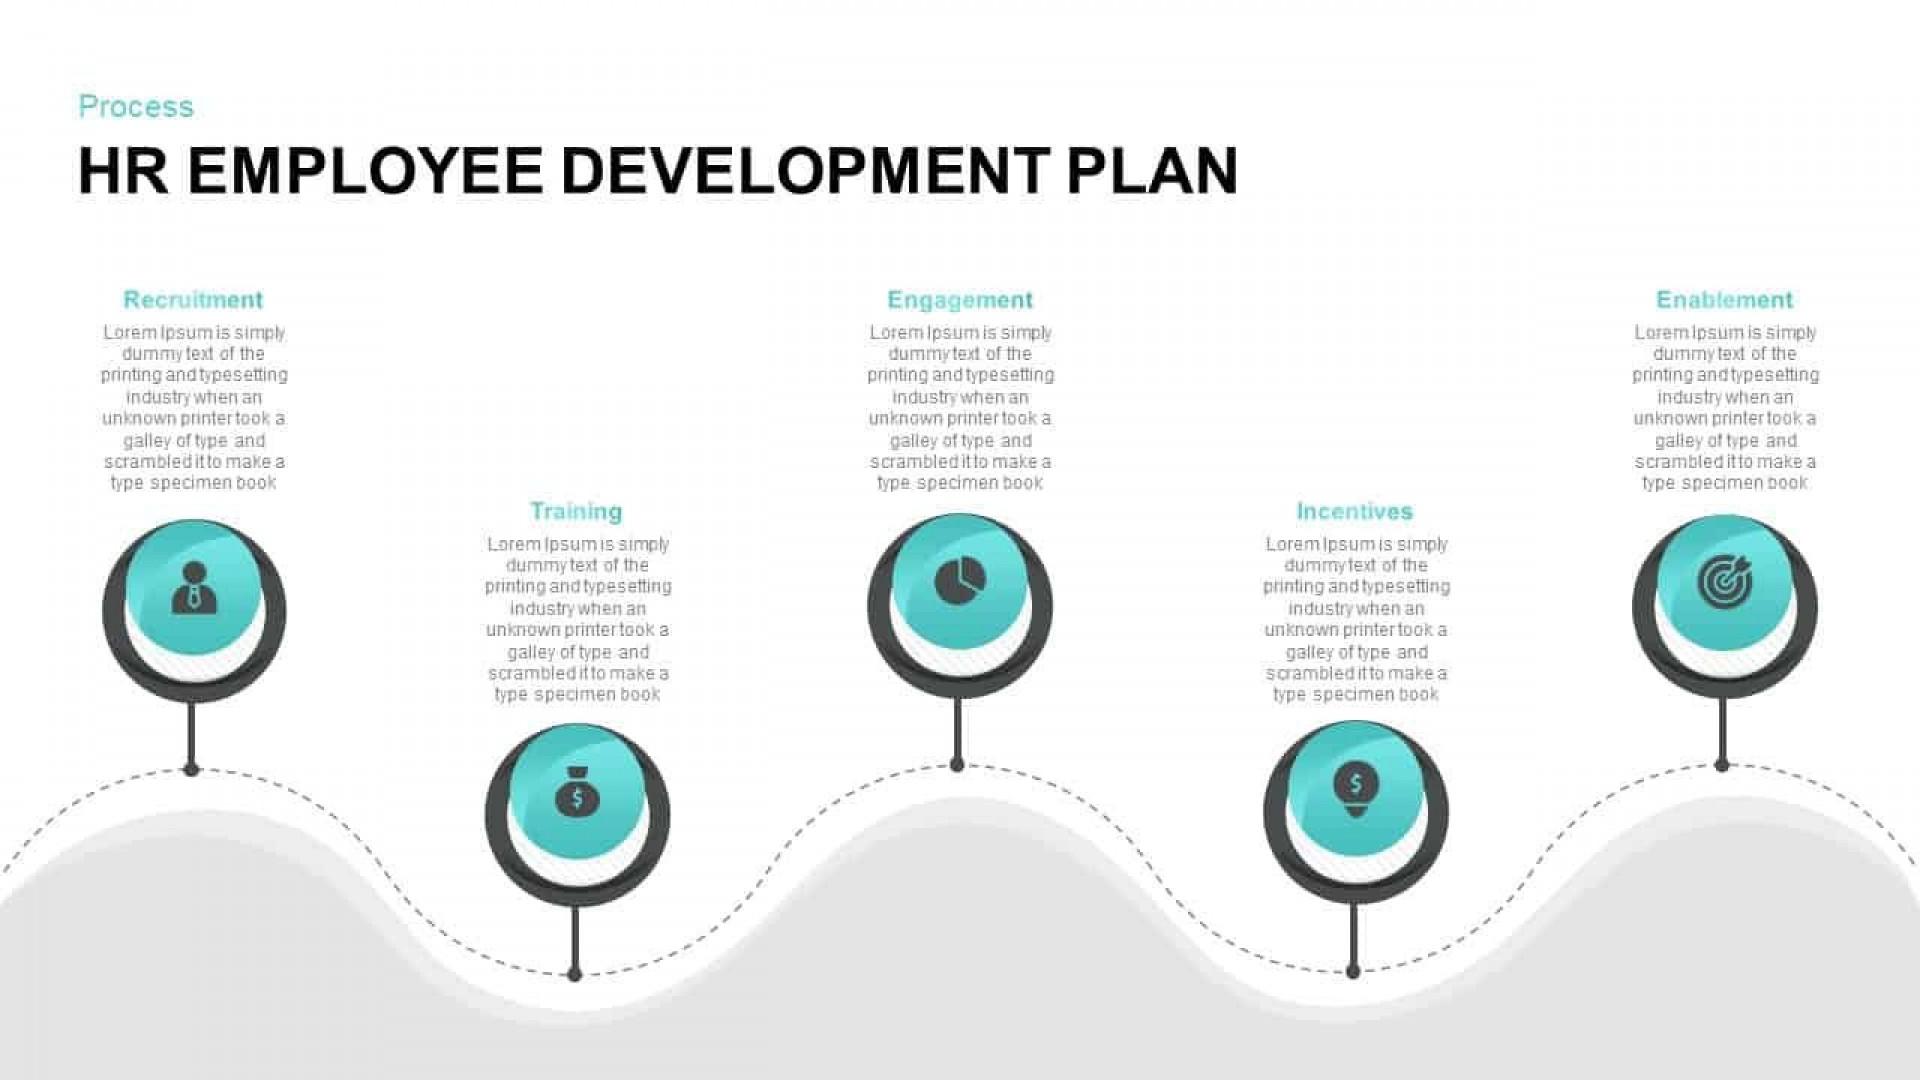 006 Incredible Employee Development Plan Template Design  Ppt Free1920